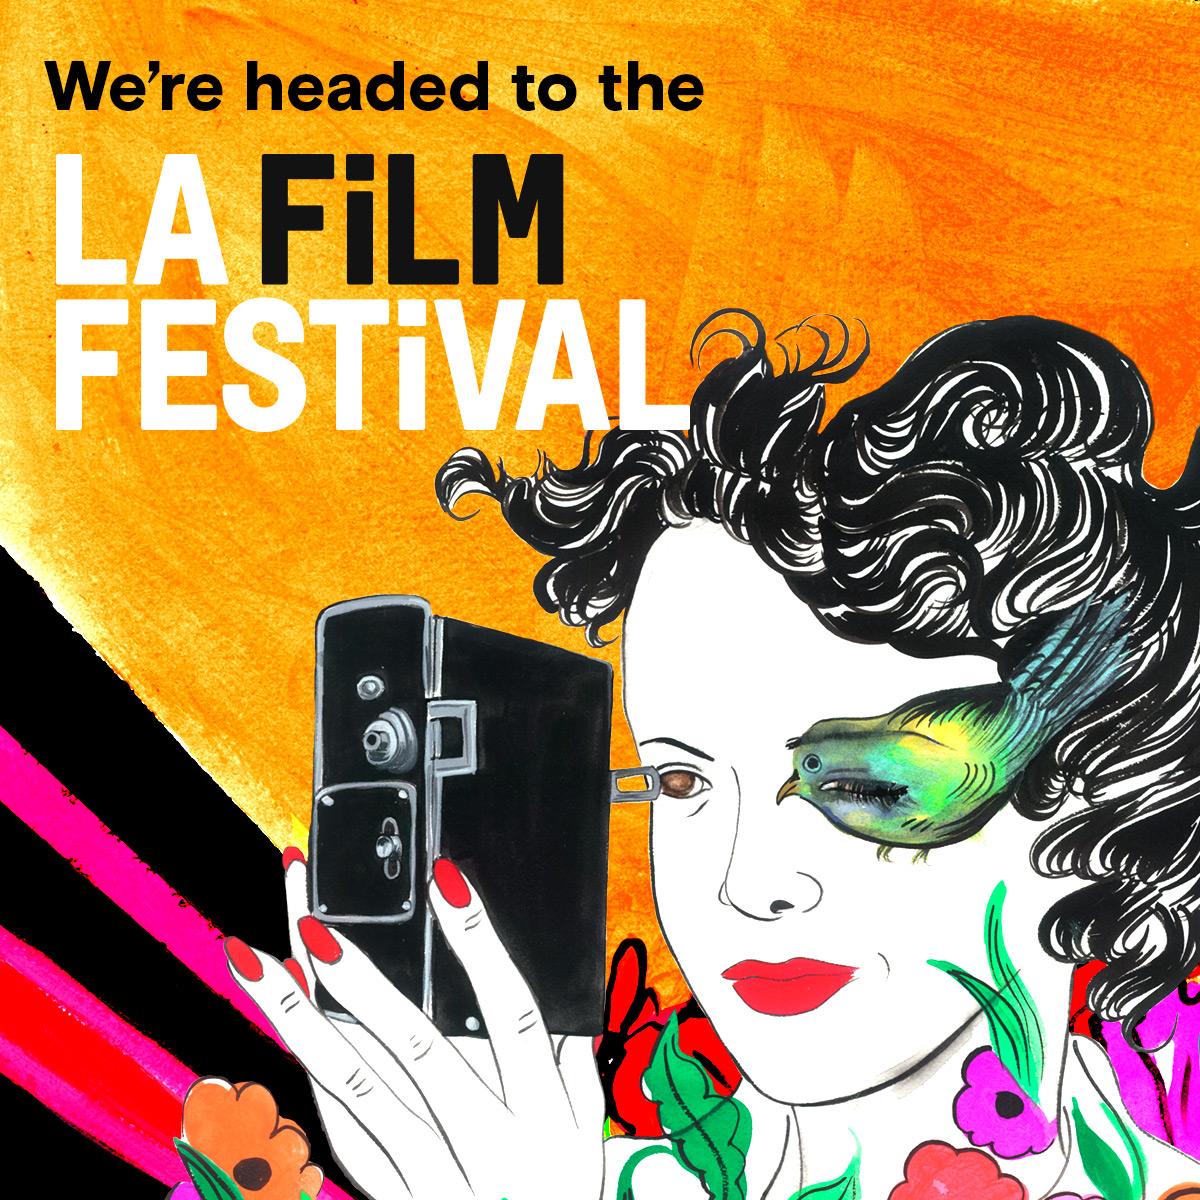 la-film-festival-selection-poster.jpg